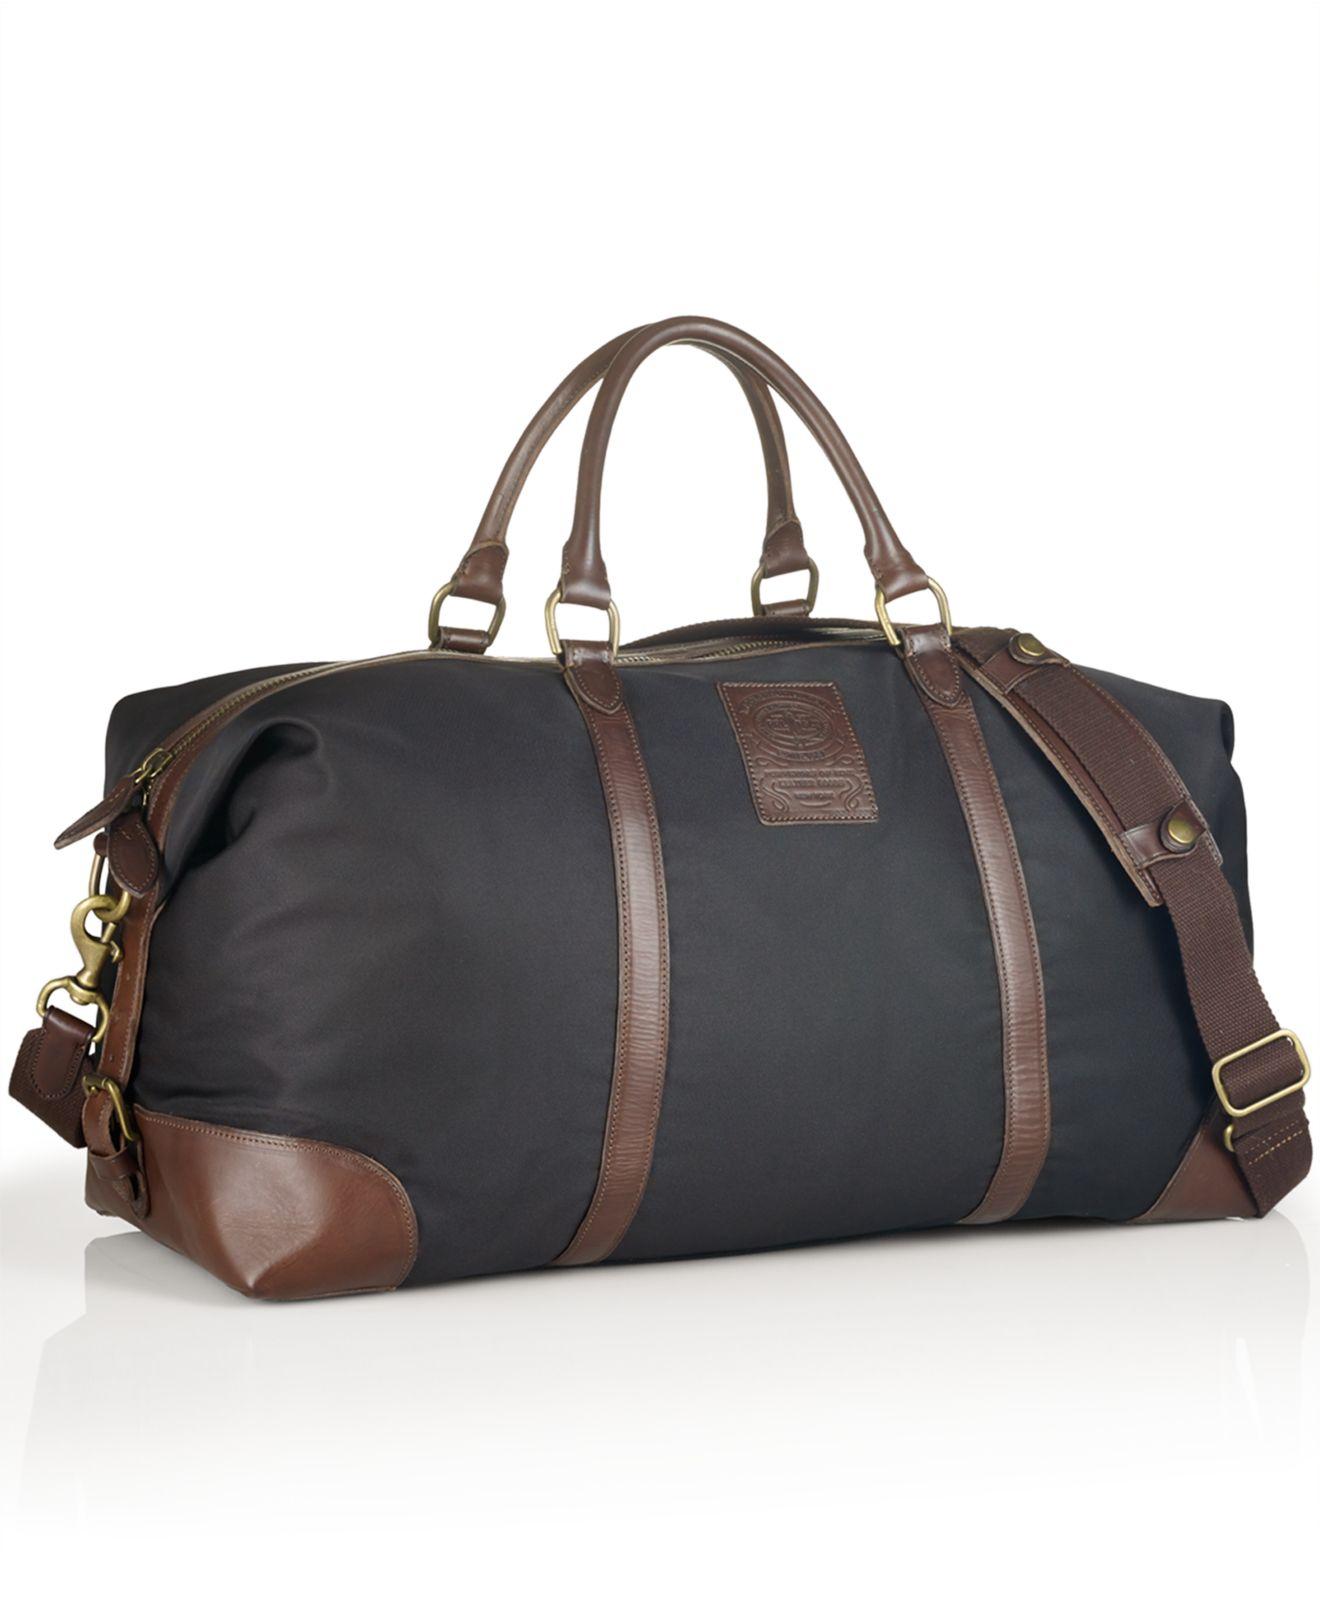 Lyst - Polo Ralph Lauren Large Nylon Duffel Bag in Black for Men dabf1ac85689e